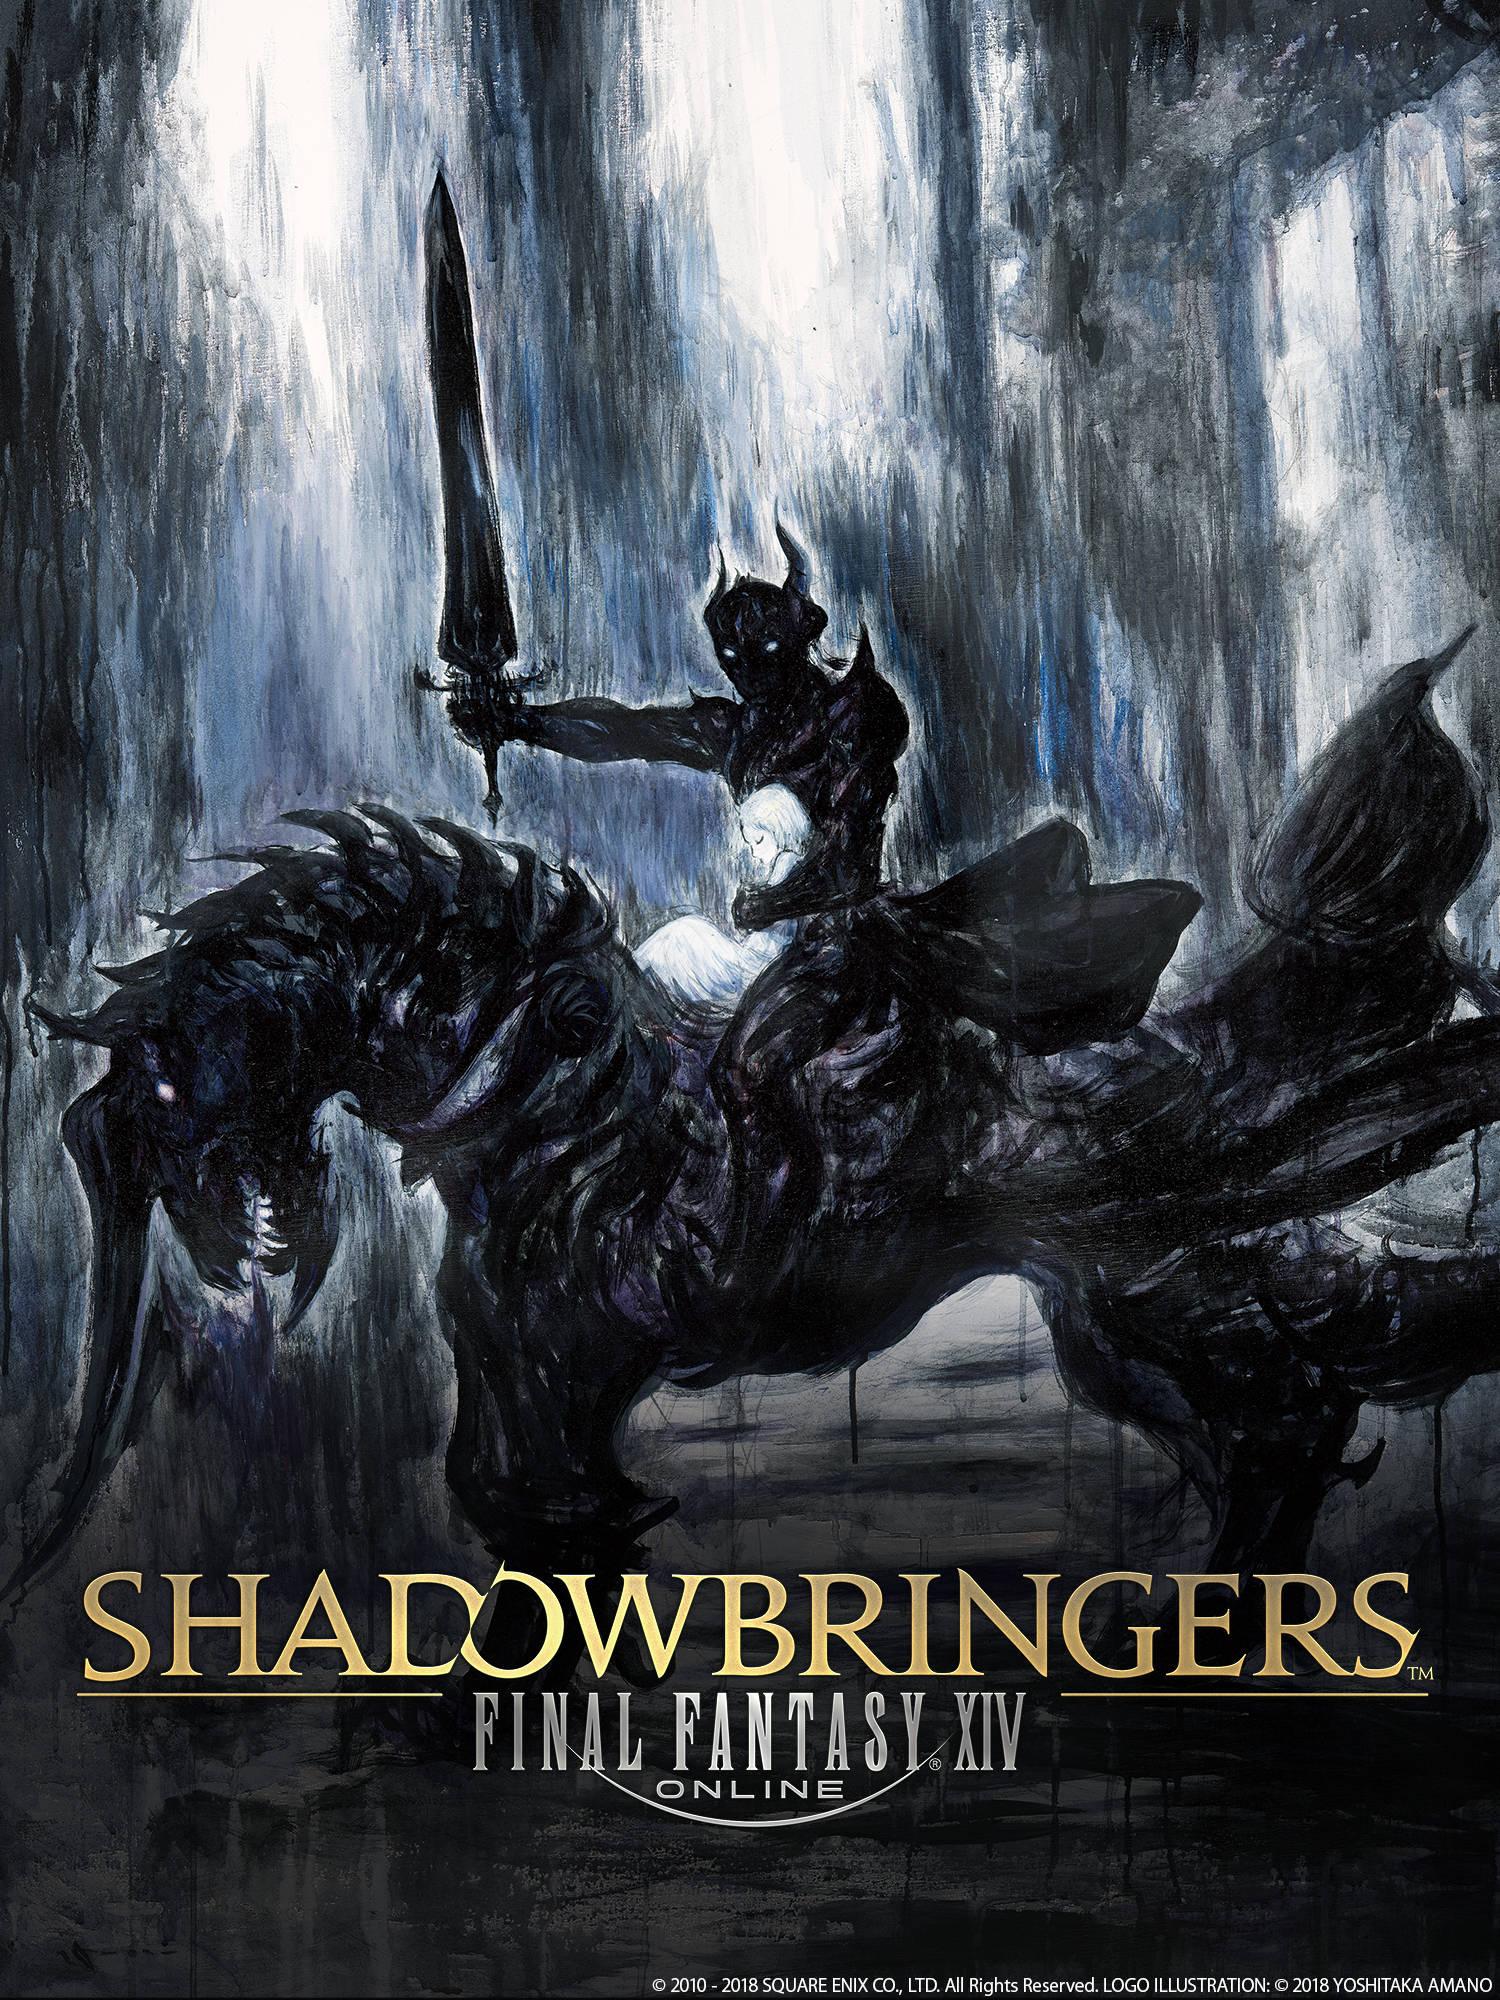 Final Fantasy XIV: Shadowbringers Announced – RPGamer